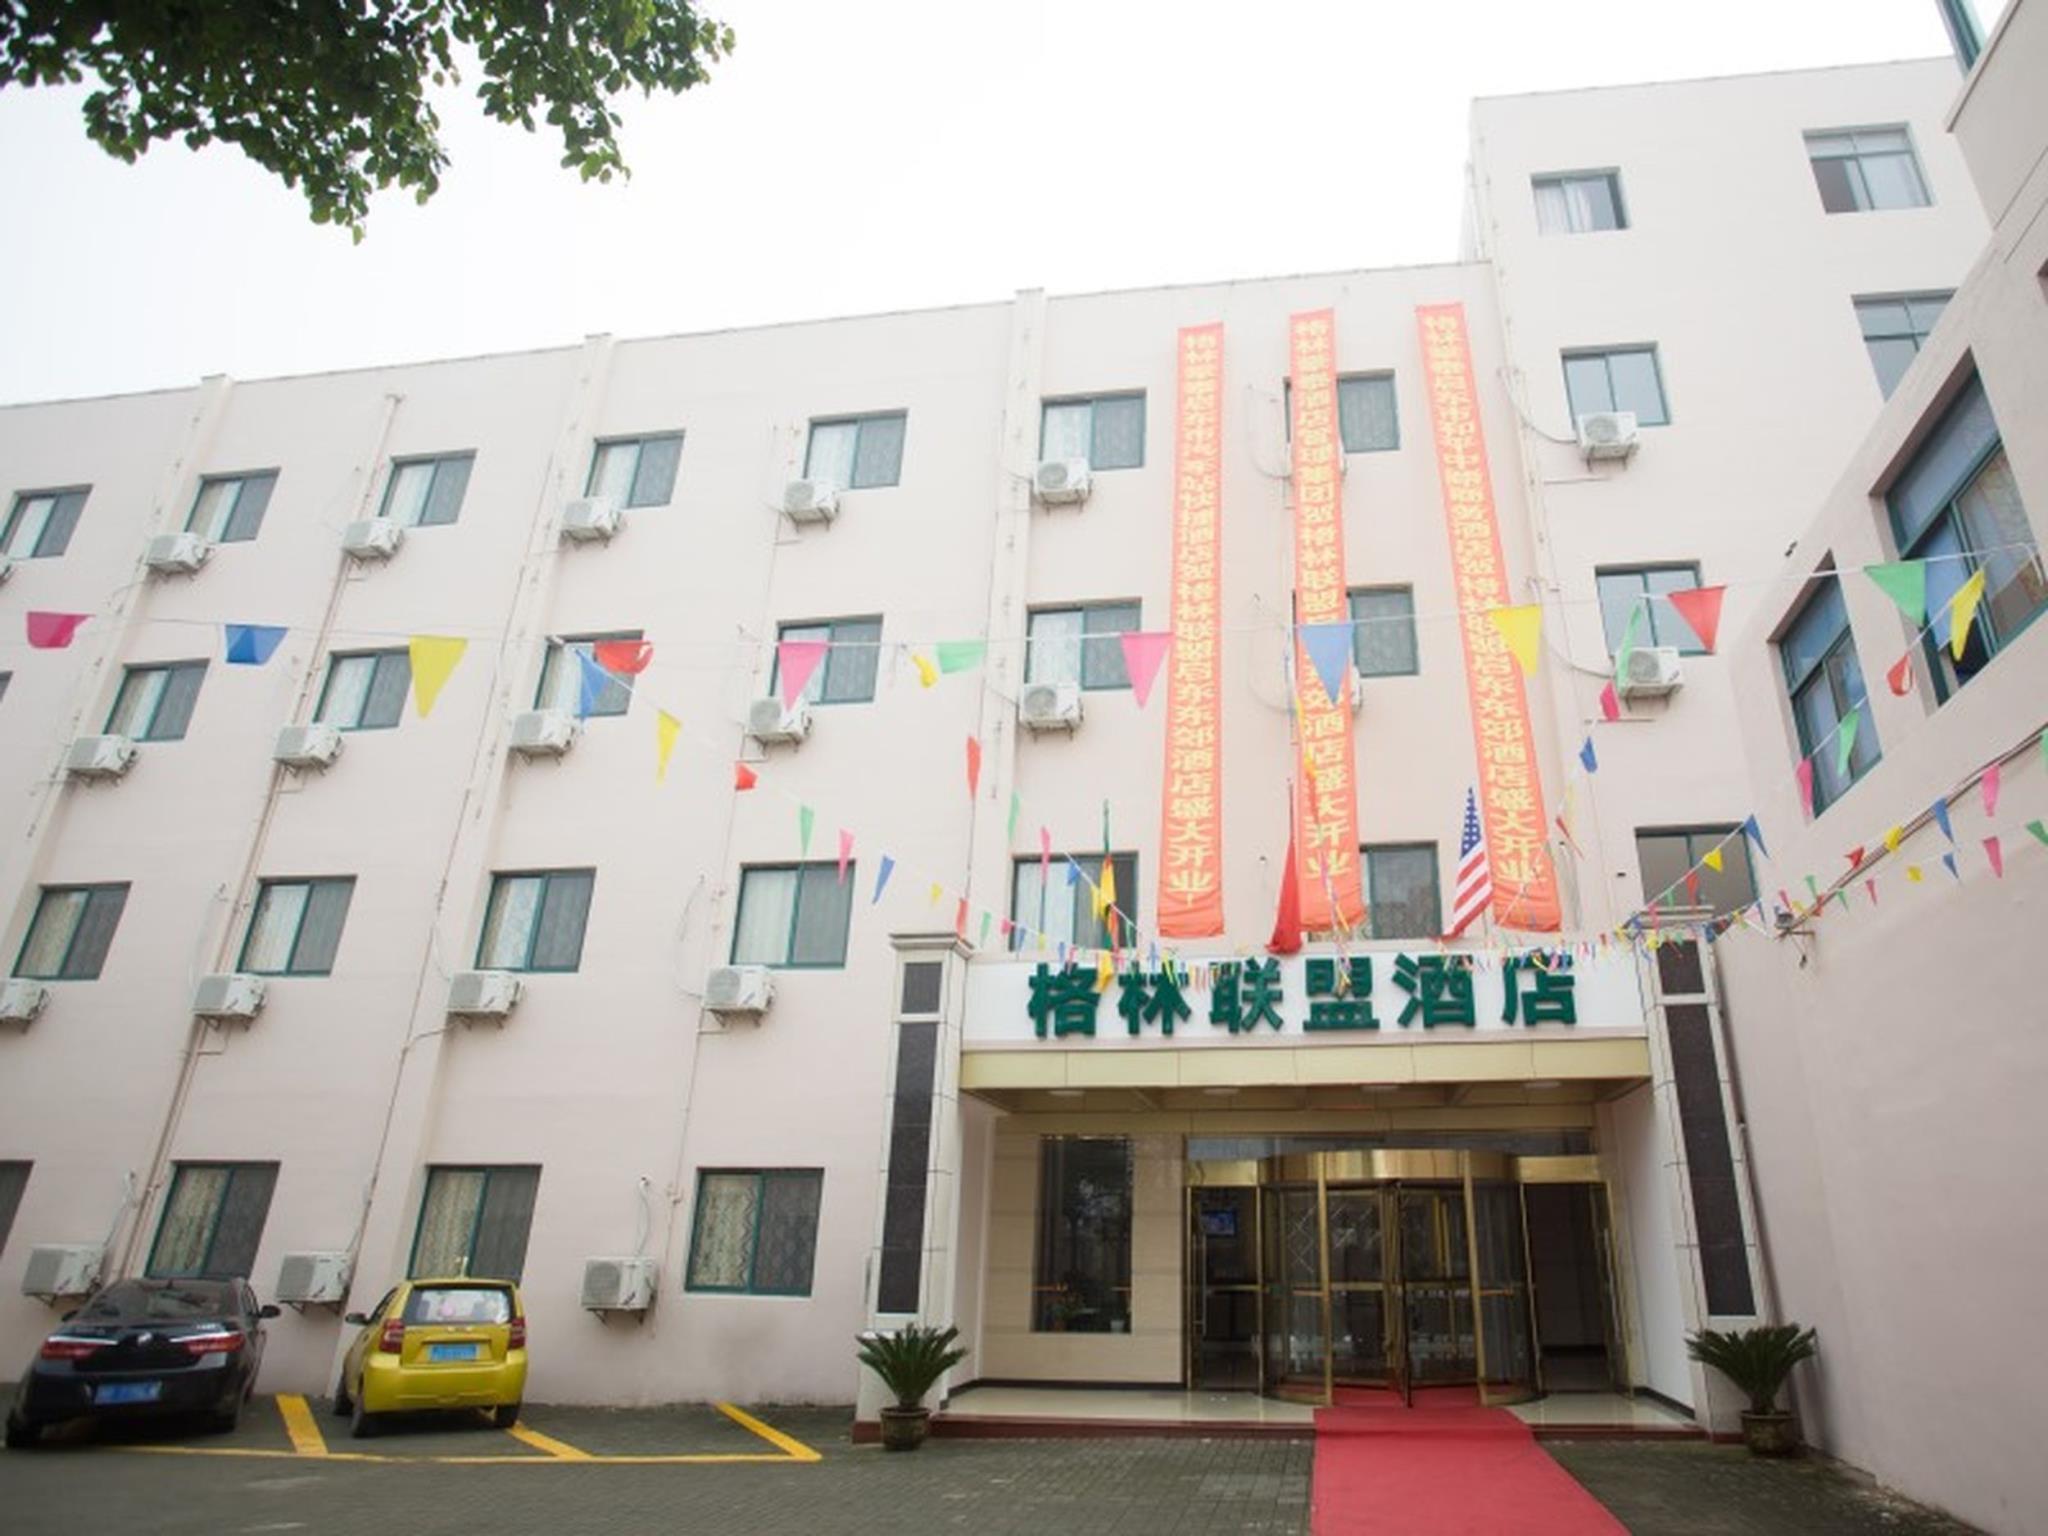 GreenTree Alliance NanTong QiDong Chengdong Bus Station RenMin  E  Road Hotel